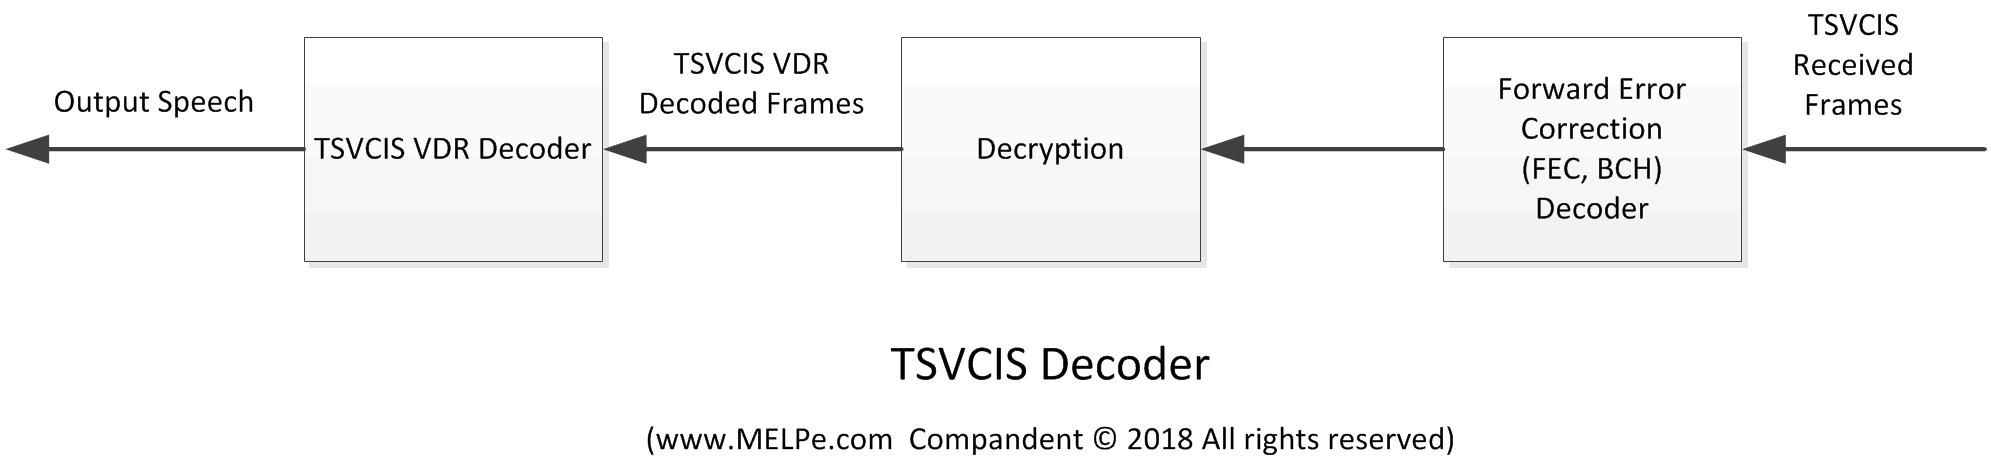 tsvcis-decoder